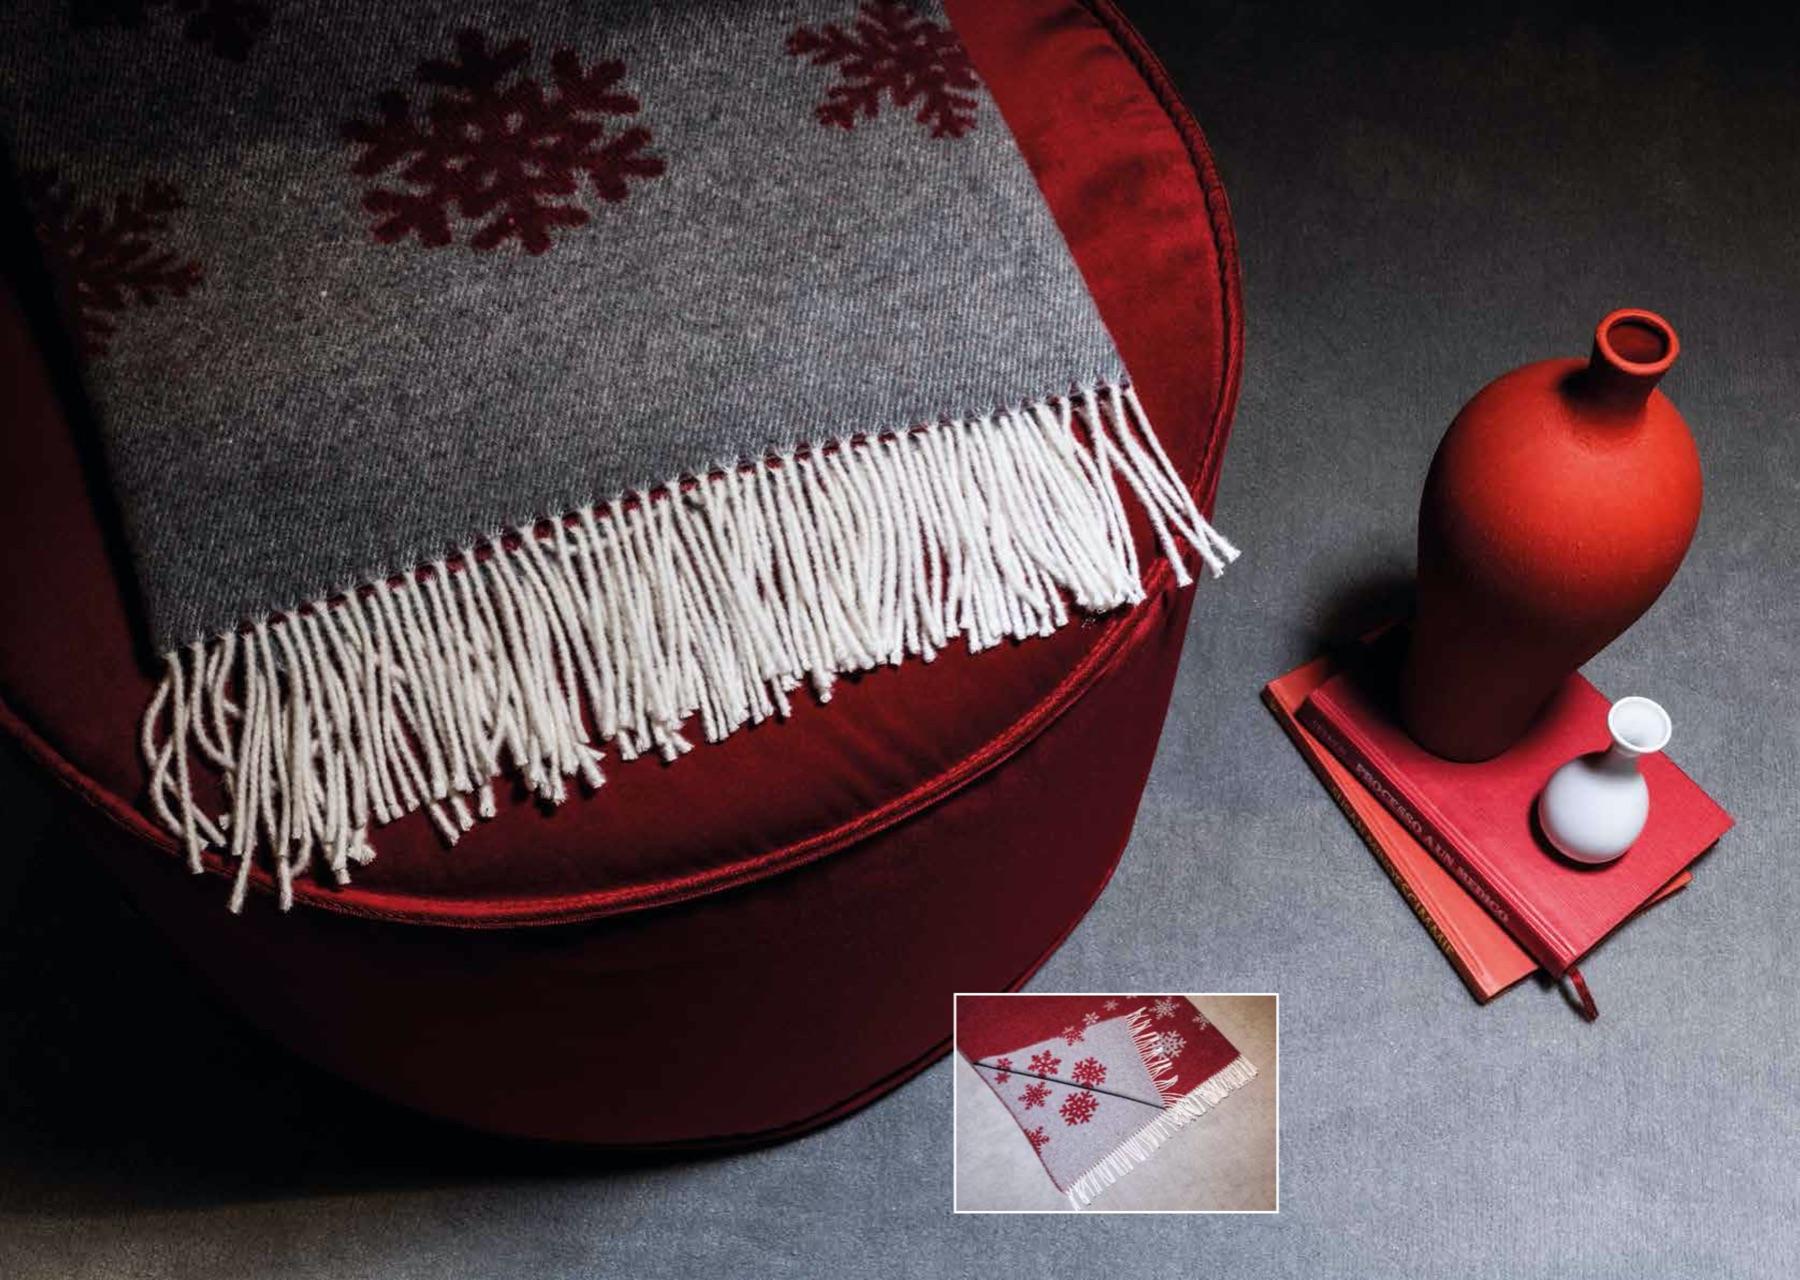 coperte plaid artigianali arredemento lombardo i plaid di arredamento lombardo